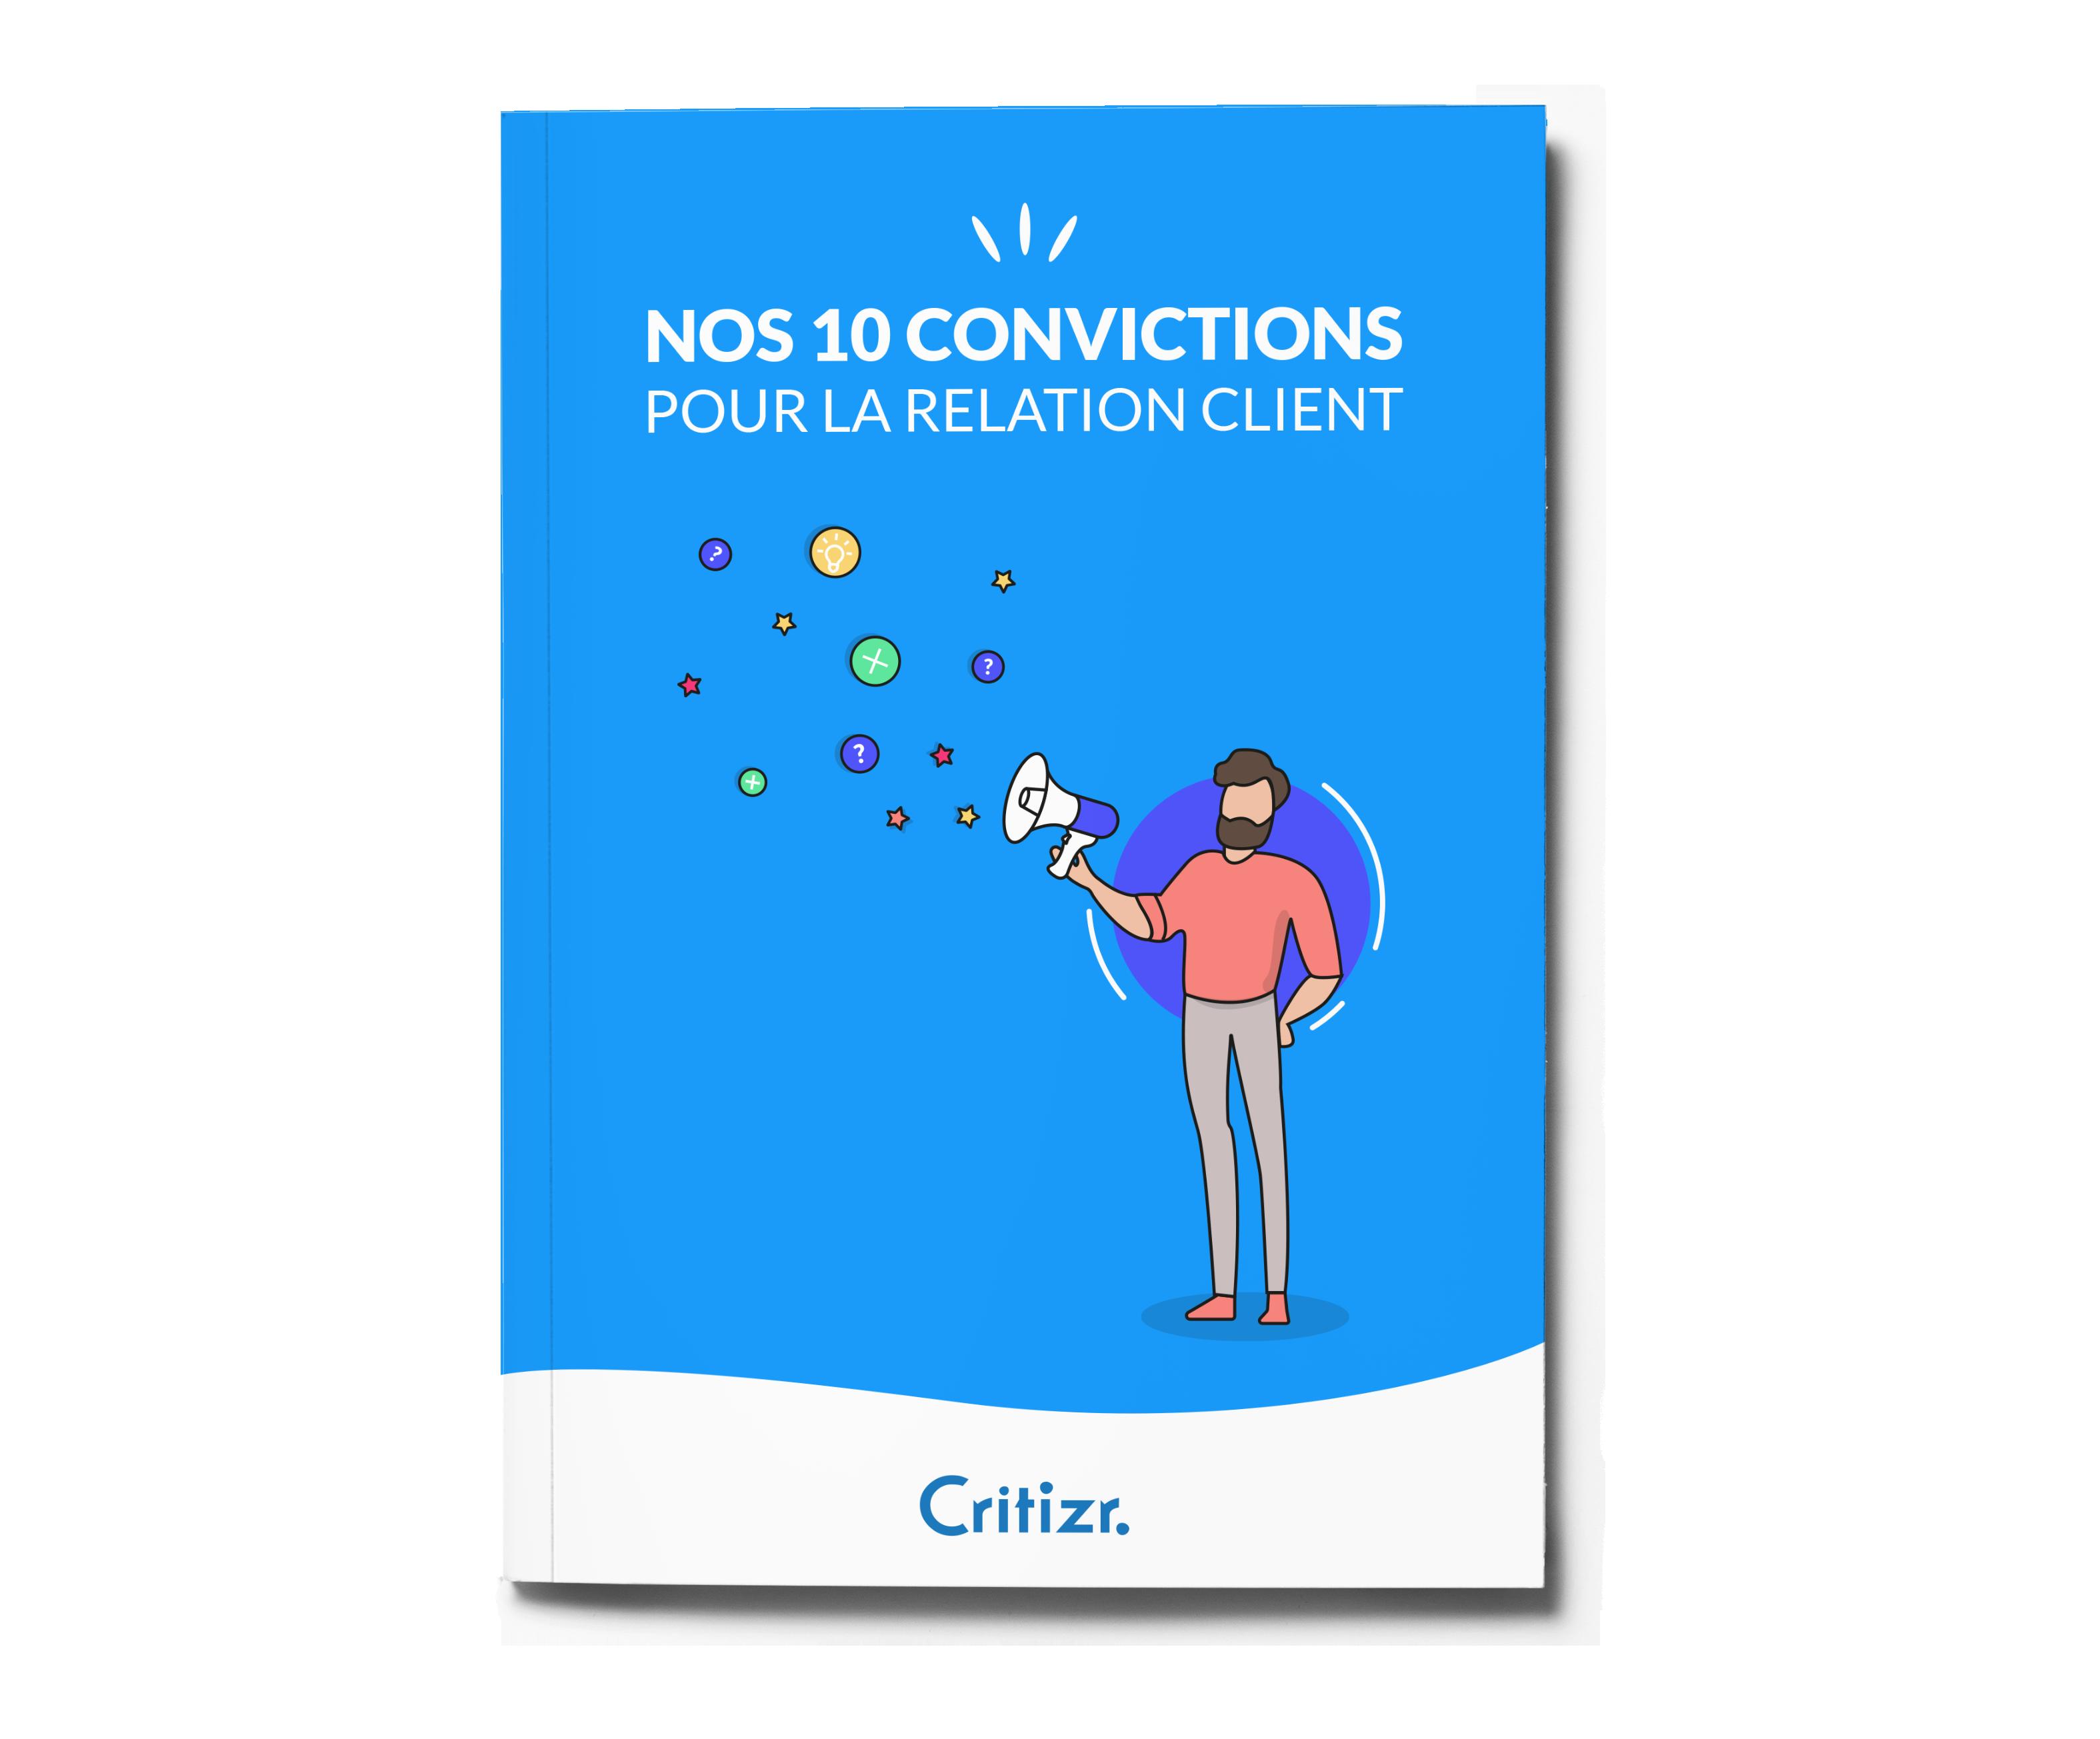 Mockup 10 convictions